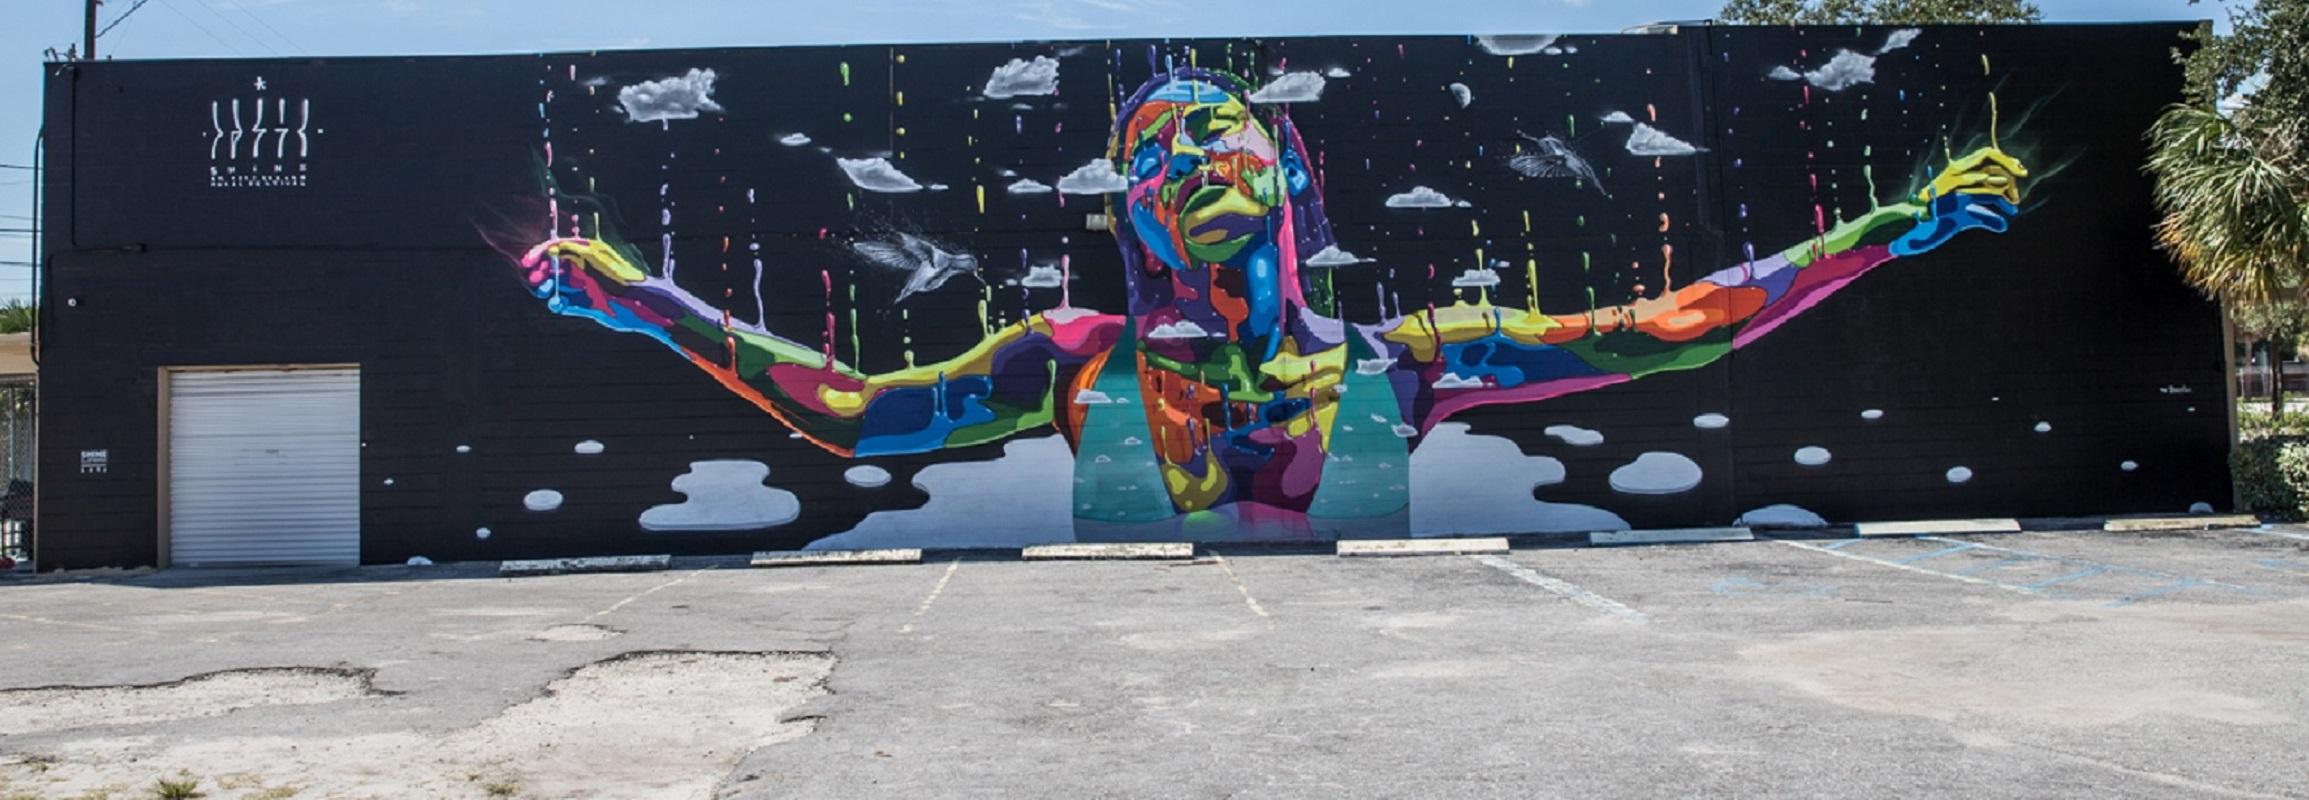 2016-09-11-SHINE-on-ST-PETE-Graffiti-Murals-DTSP-Dasic-Fernandez-1720-Central-Avenue-1